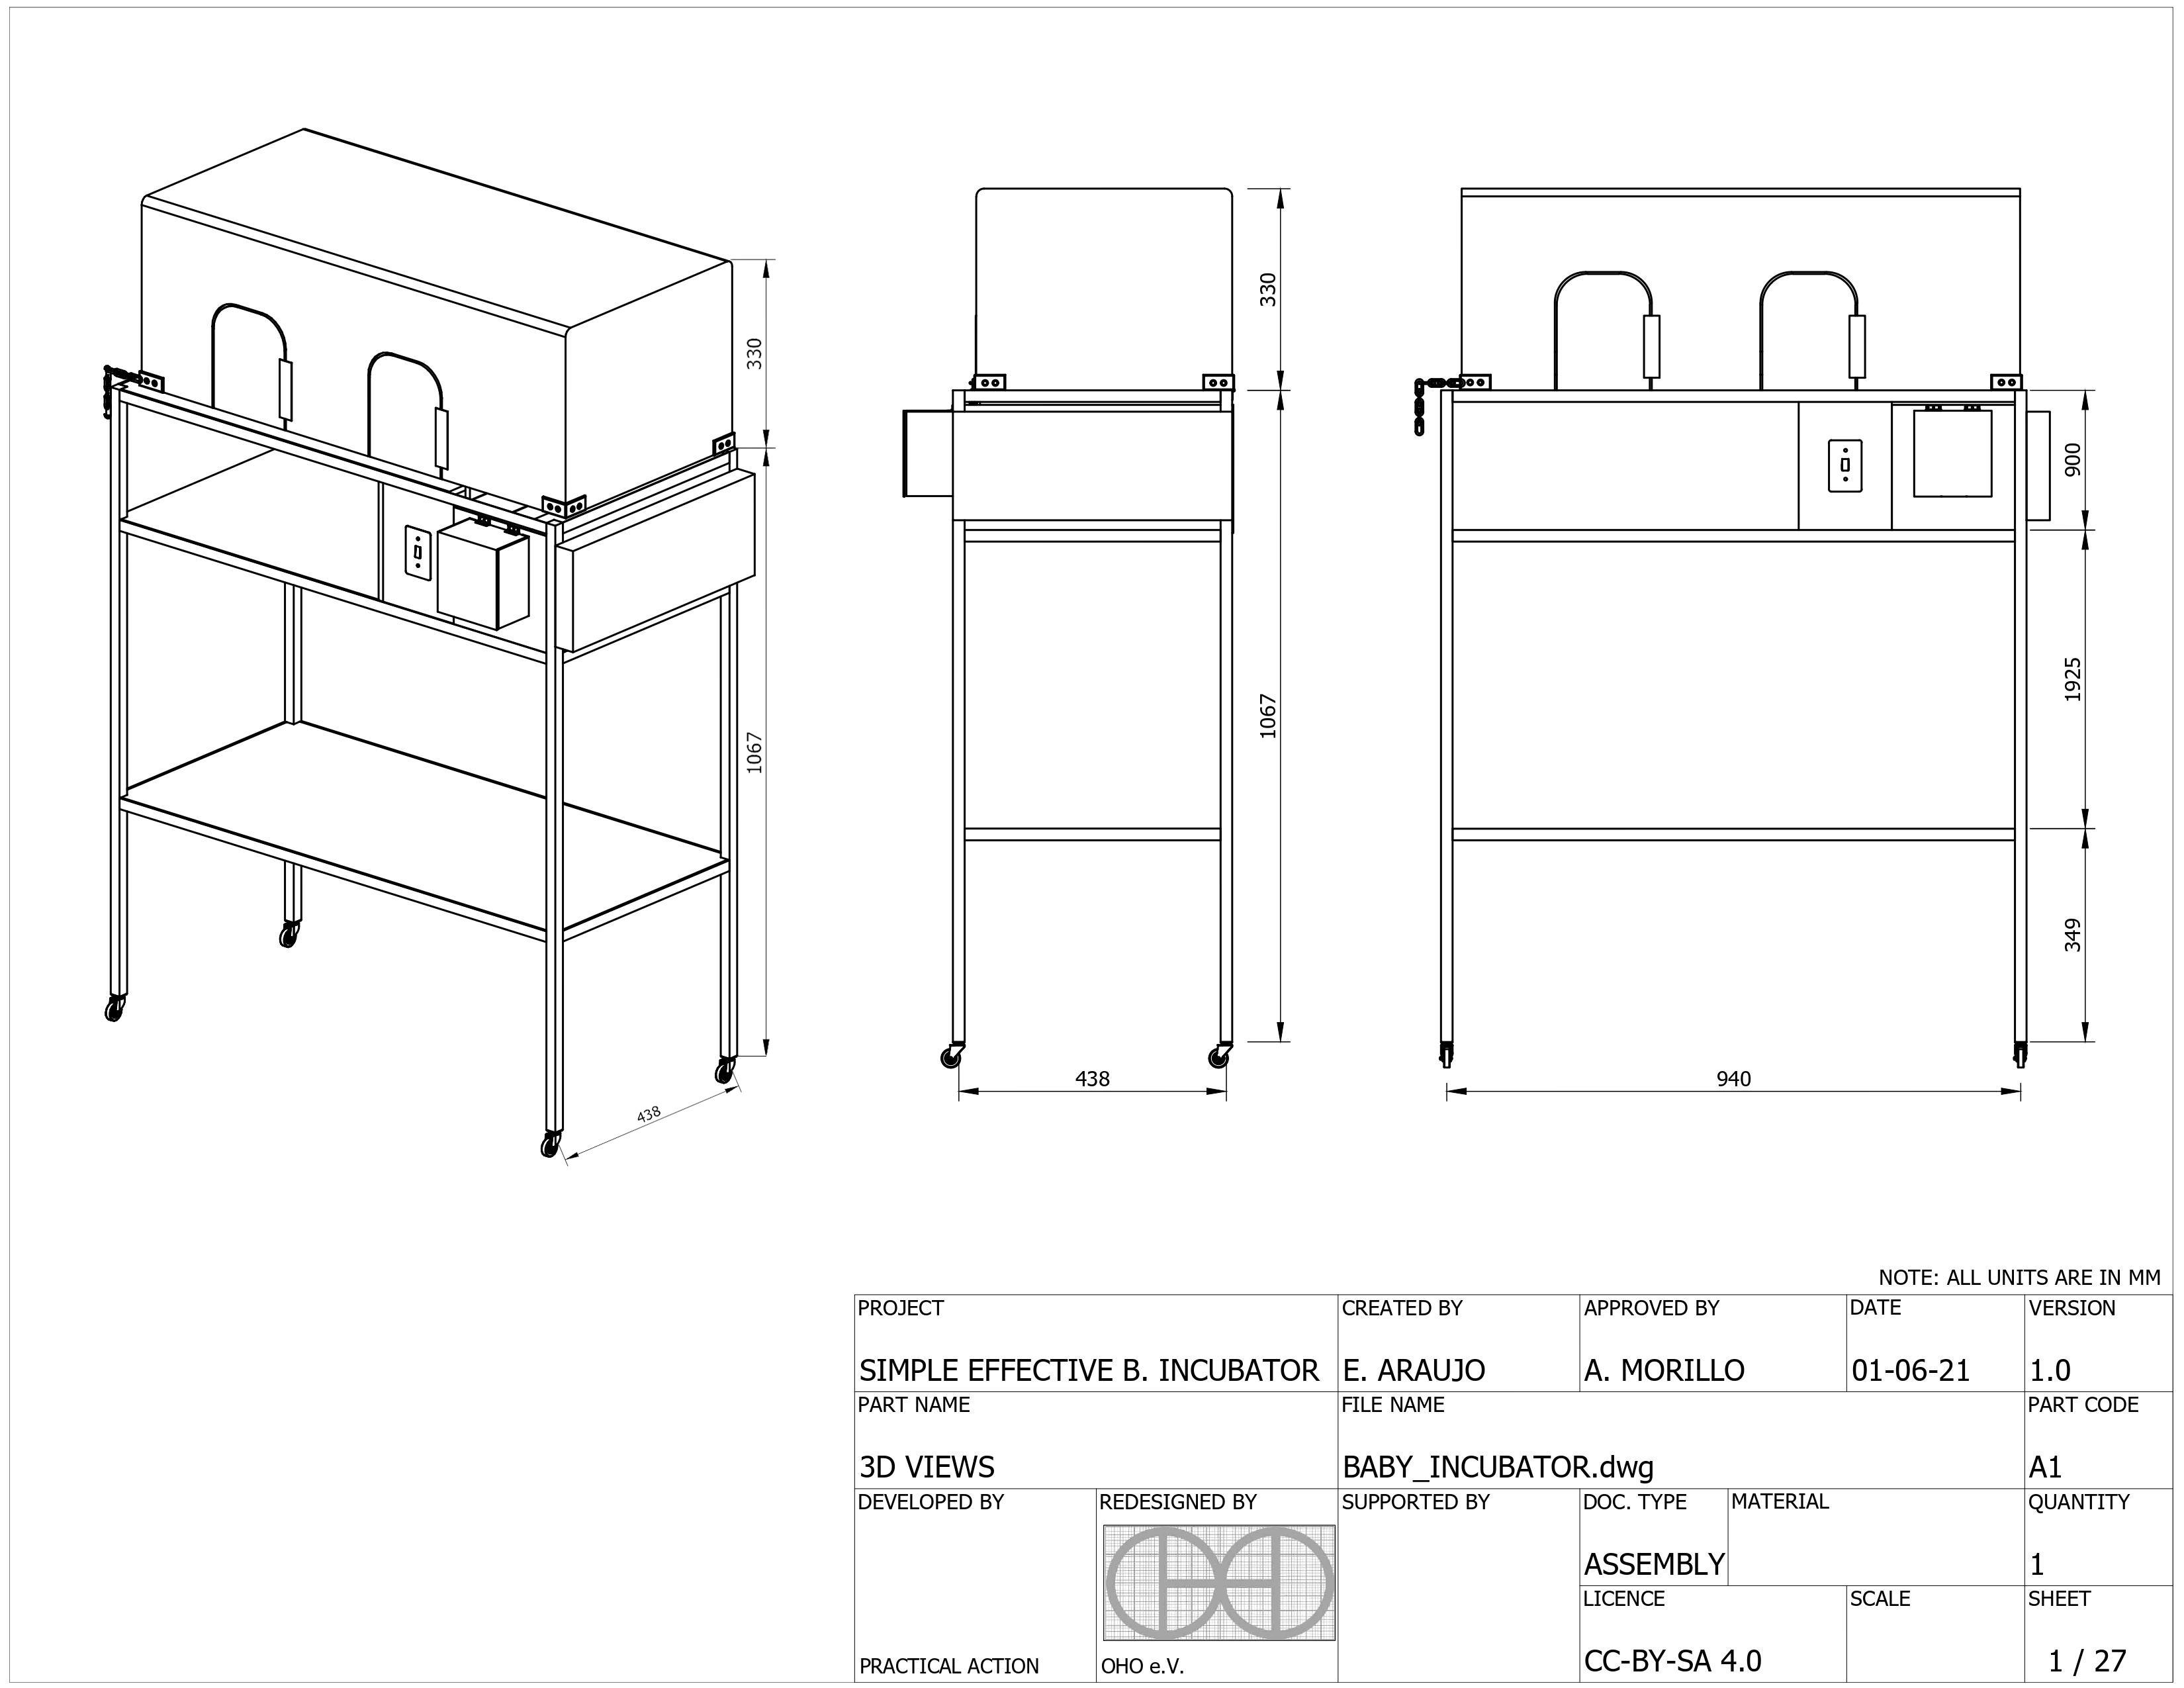 Pac sbi simple-effective-baby-incubator 0001.jpg